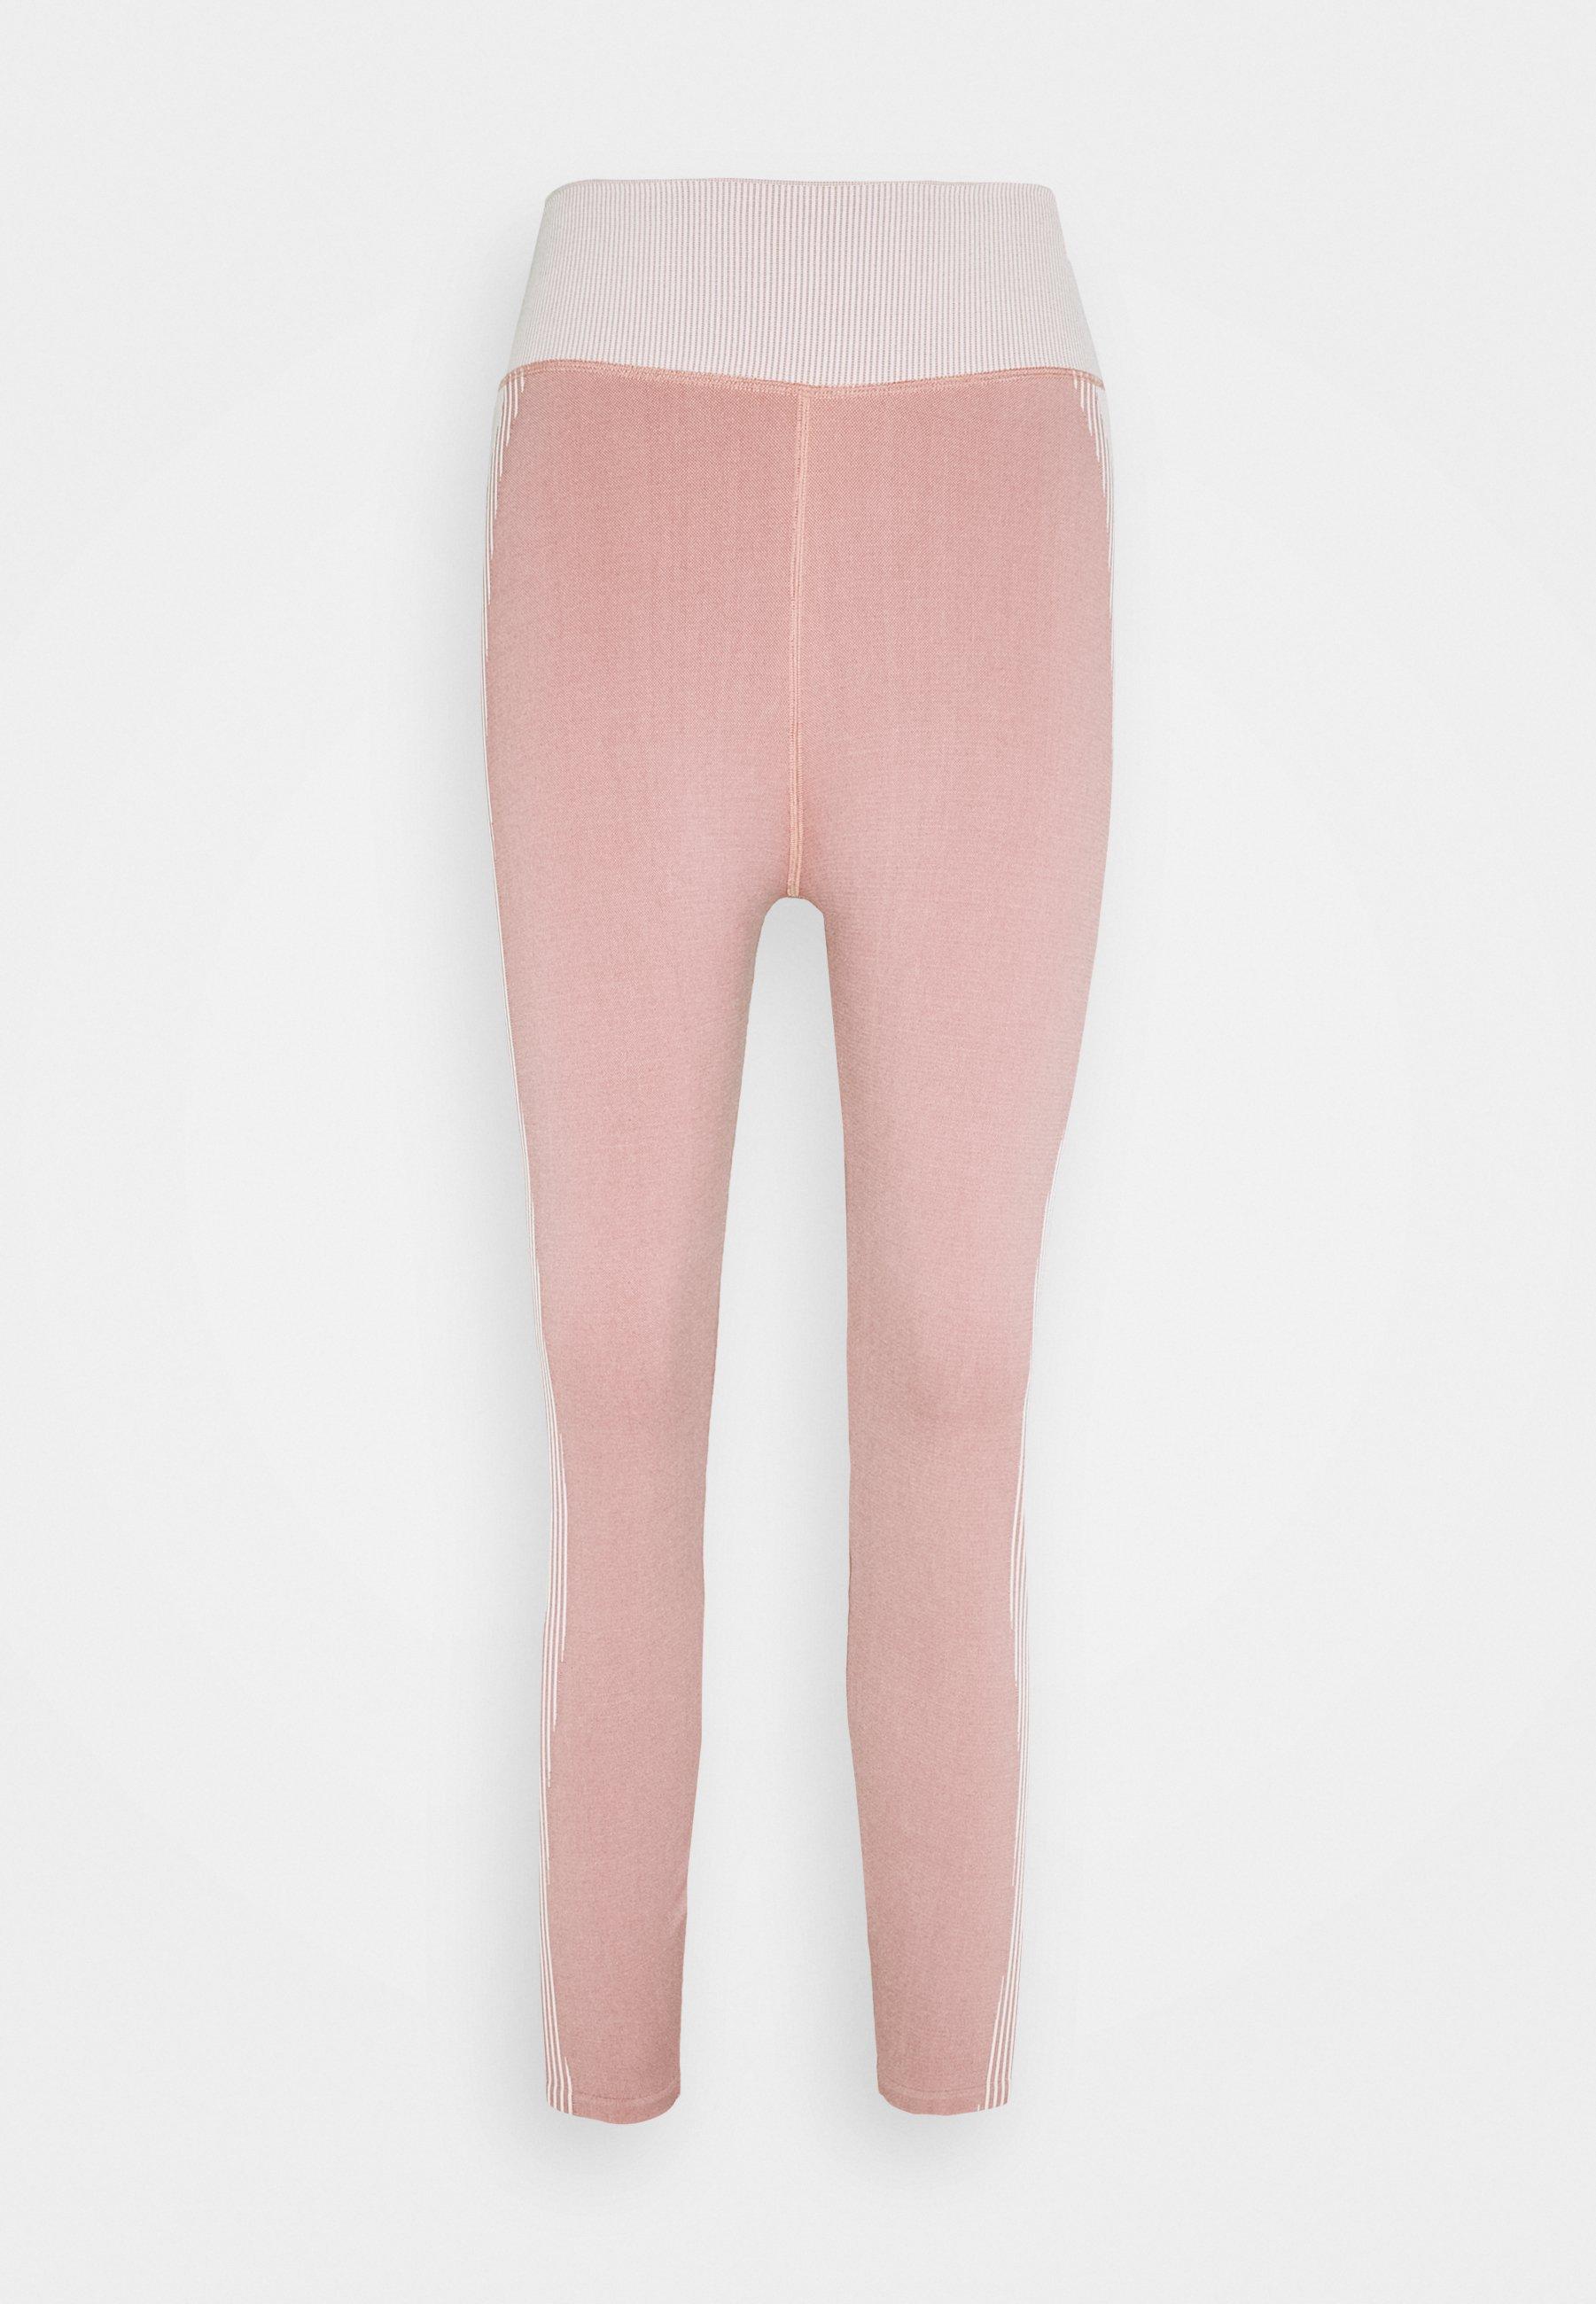 Femme CONTOUR SEAMLESS LEGGING - Collants